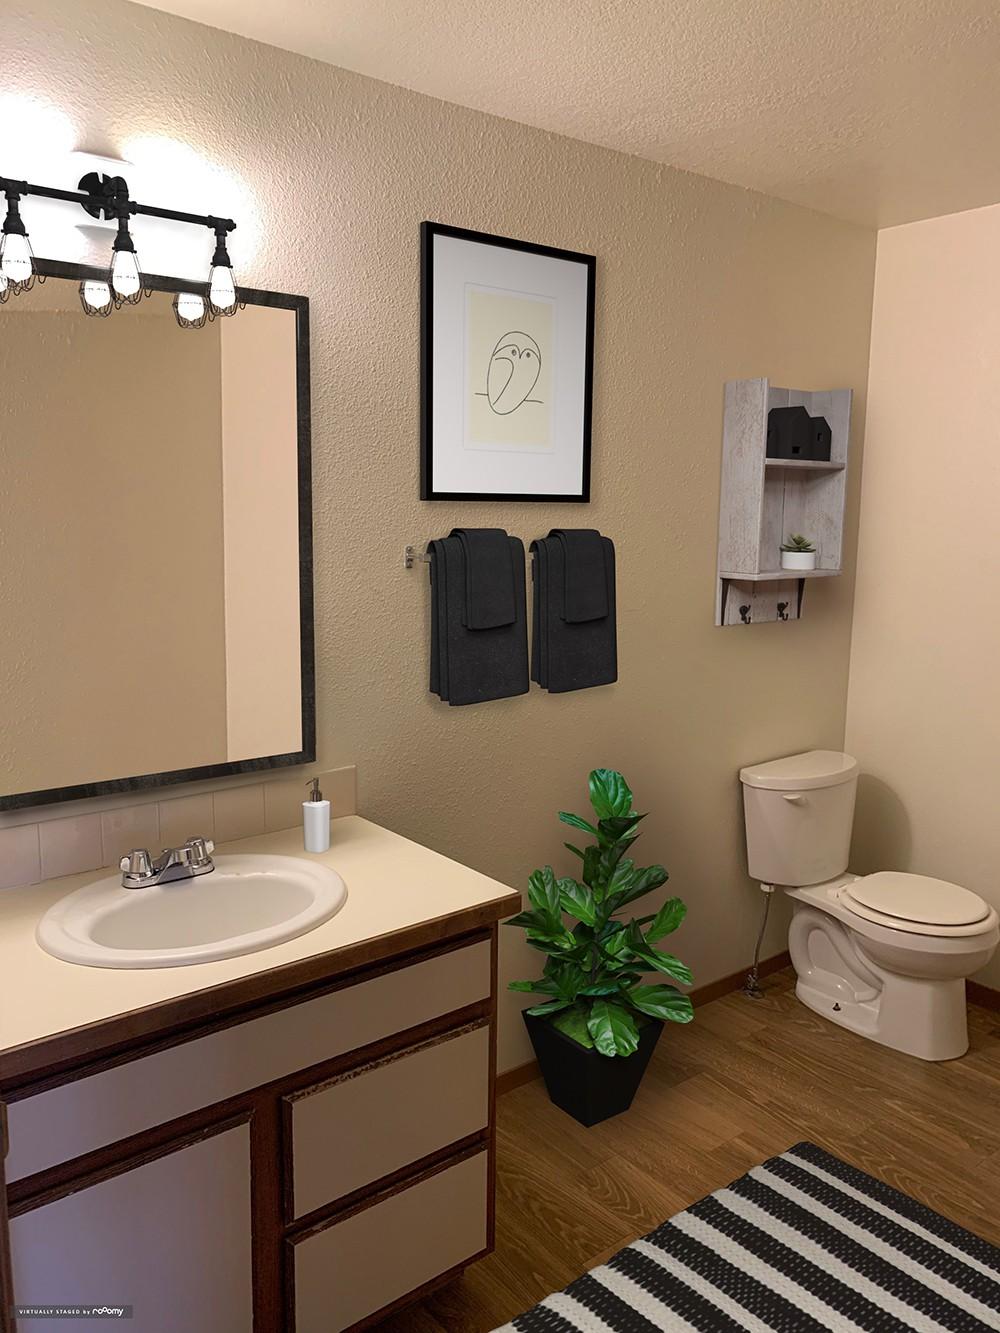 Apartments Near Bold Beauty Academy Shiloh Glen - Affordable Housing for Bold Beauty Academy Students in Billings, MT